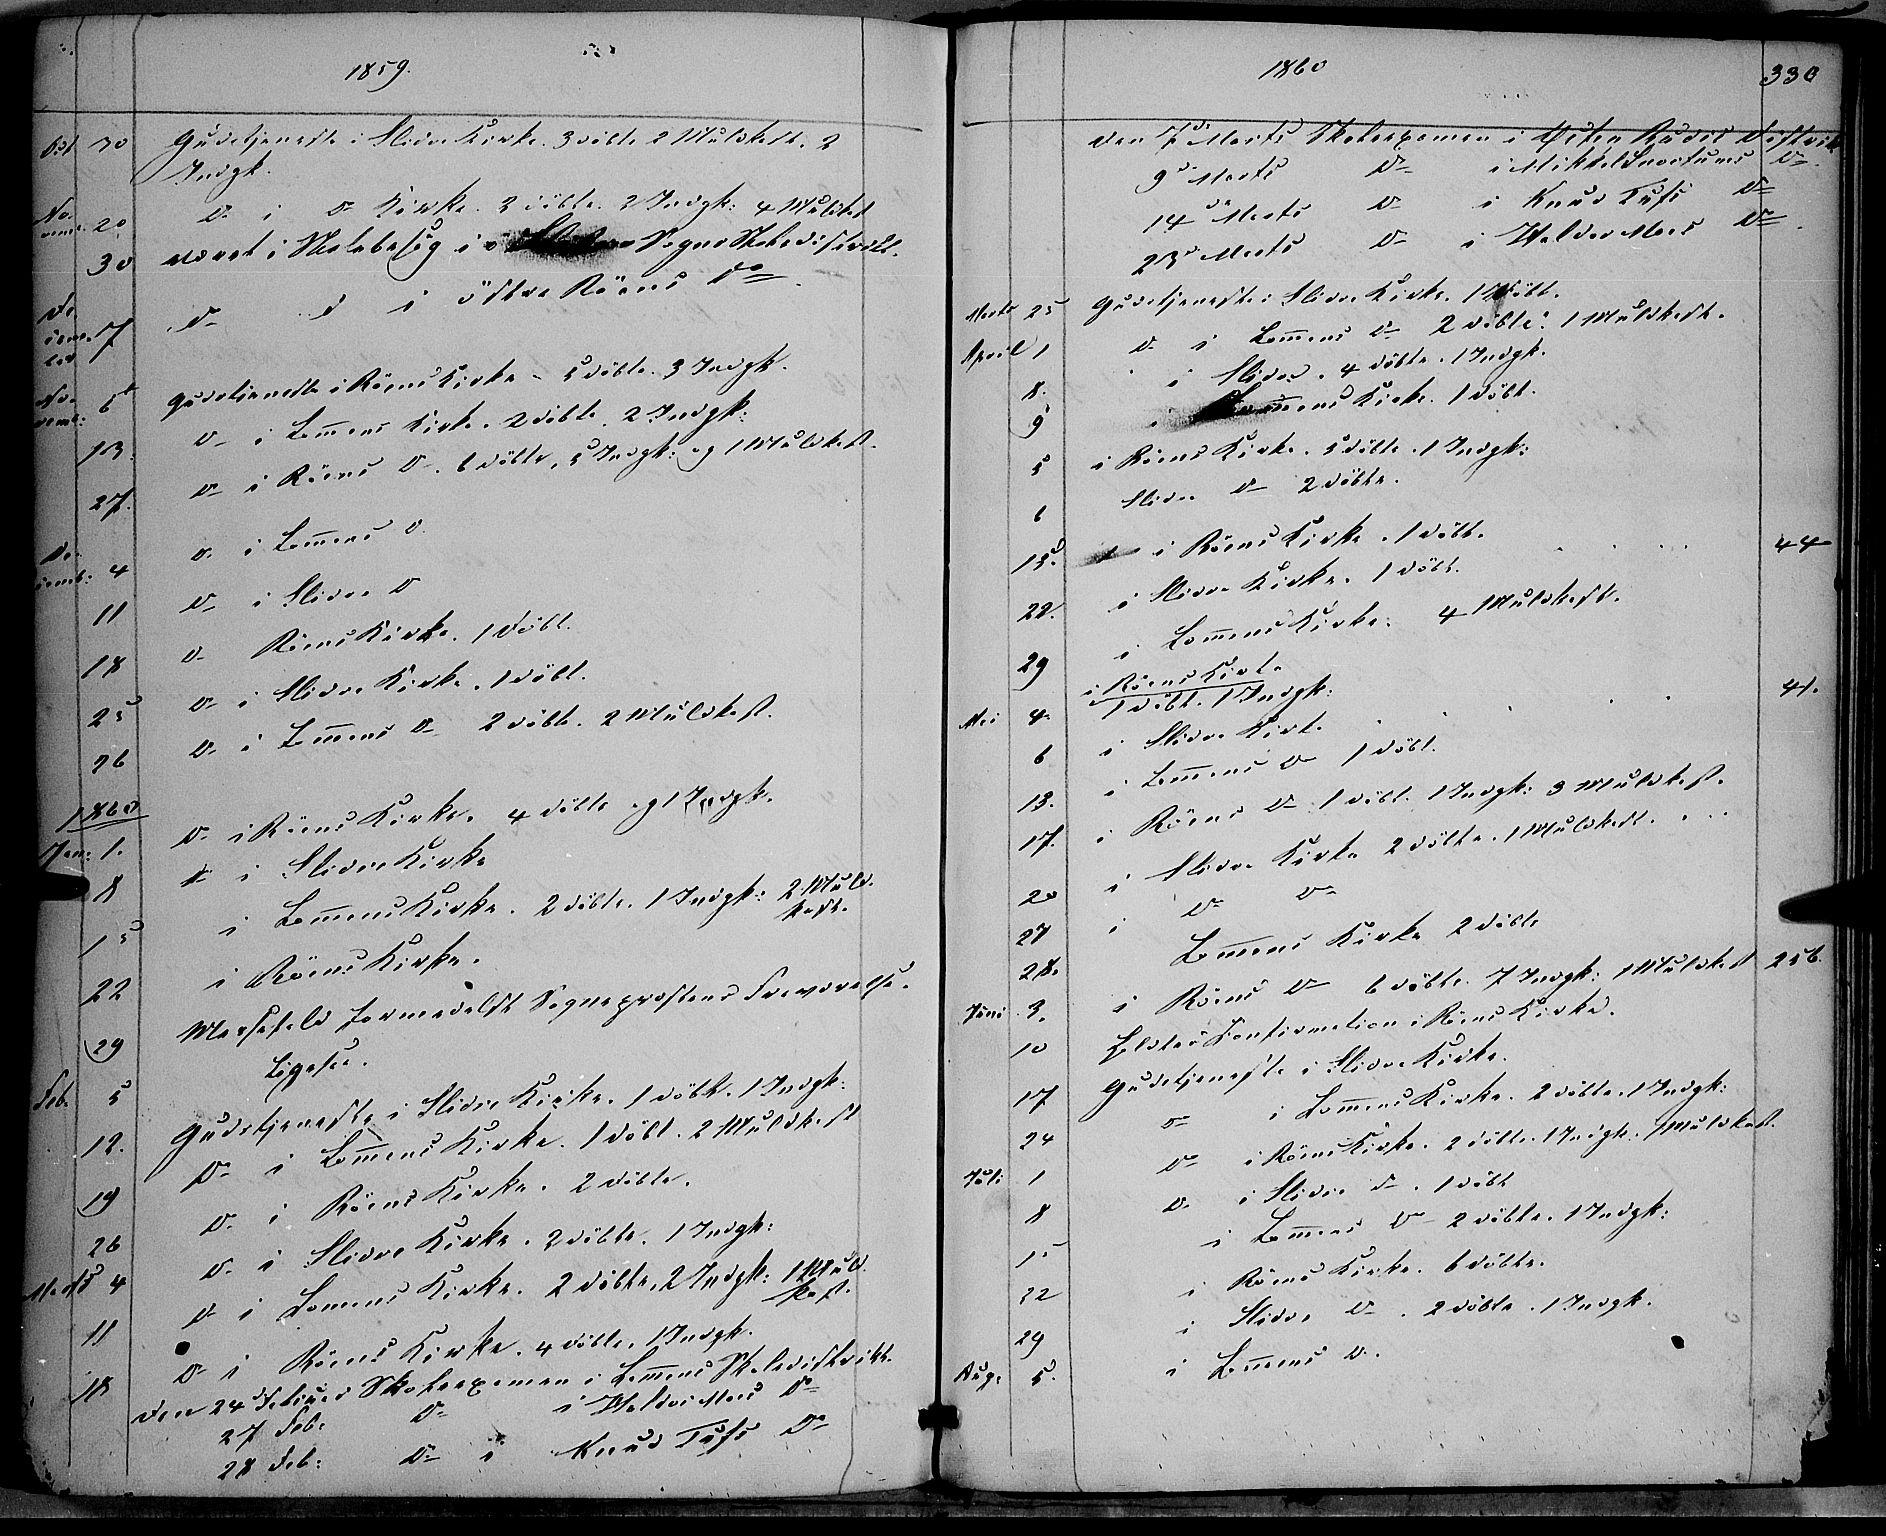 SAH, Vestre Slidre prestekontor, Ministerialbok nr. 2, 1856-1864, s. 330